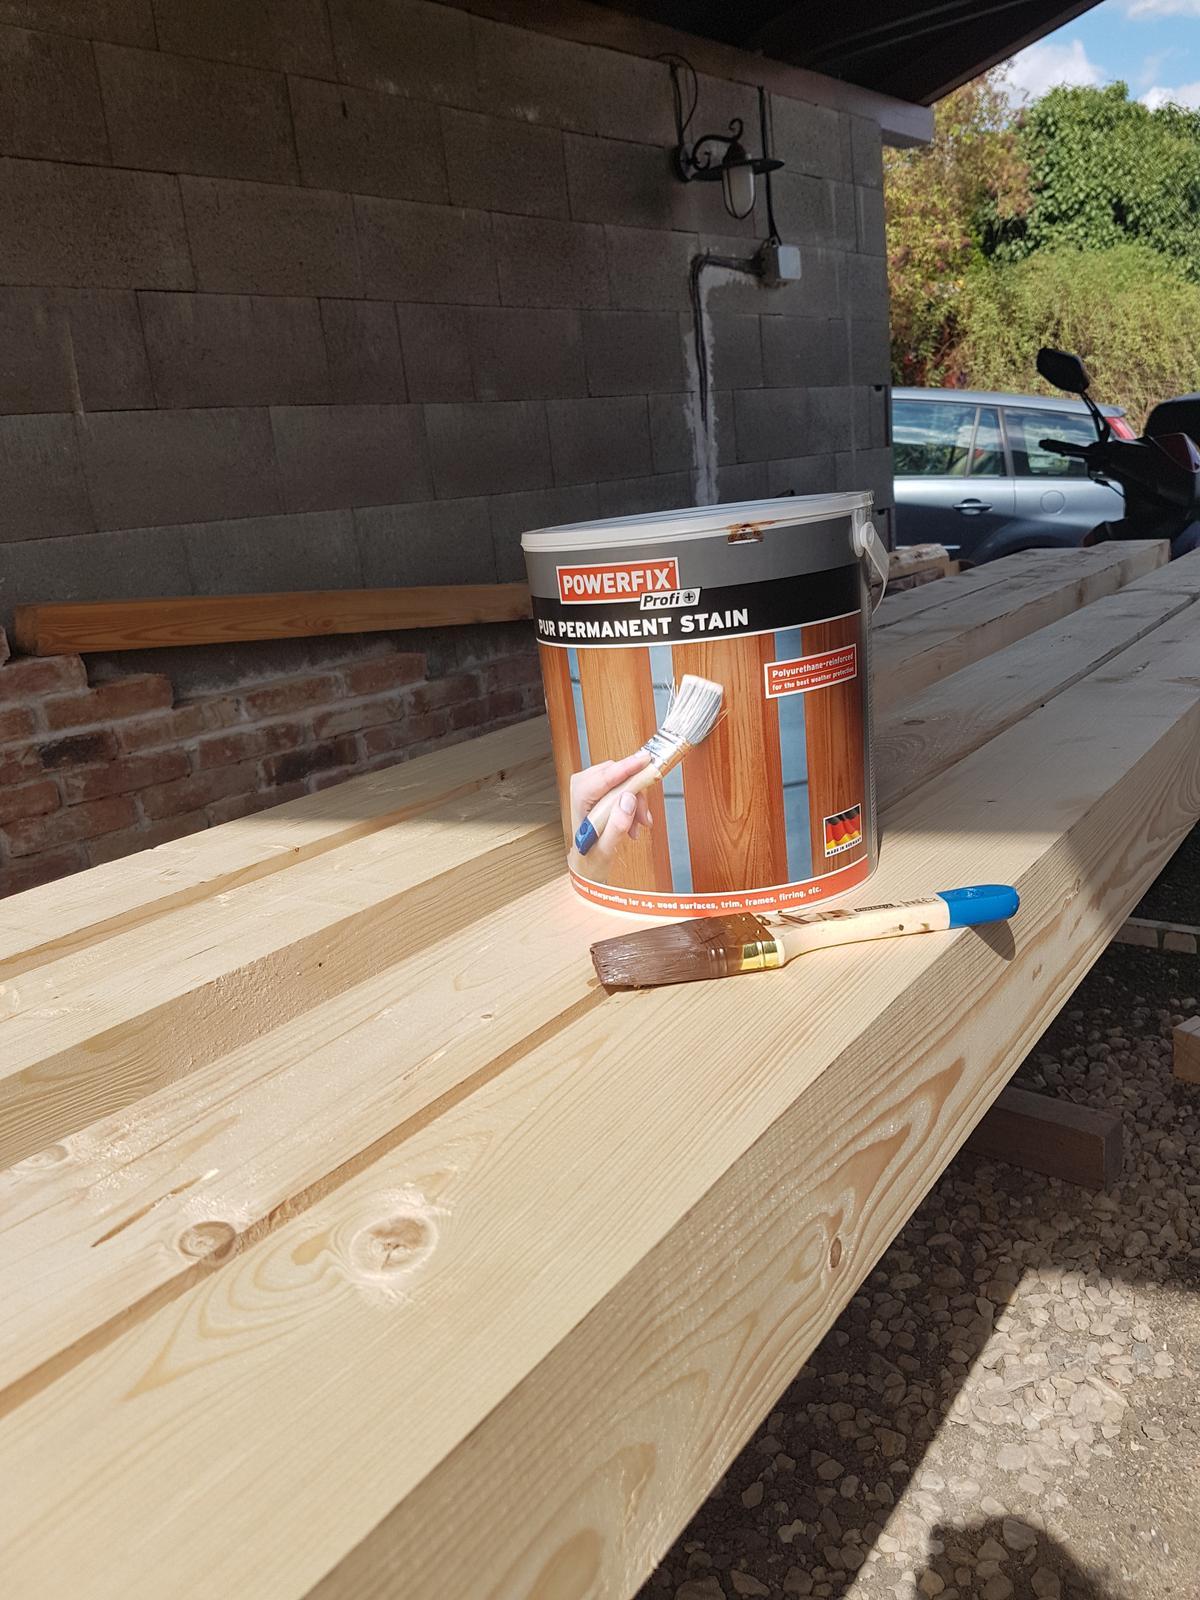 Drevník a kafé kútik - projekt roku  2018 - Mame drevo na drevník! Môžme pokračovať! Natieračske práce zahájené.